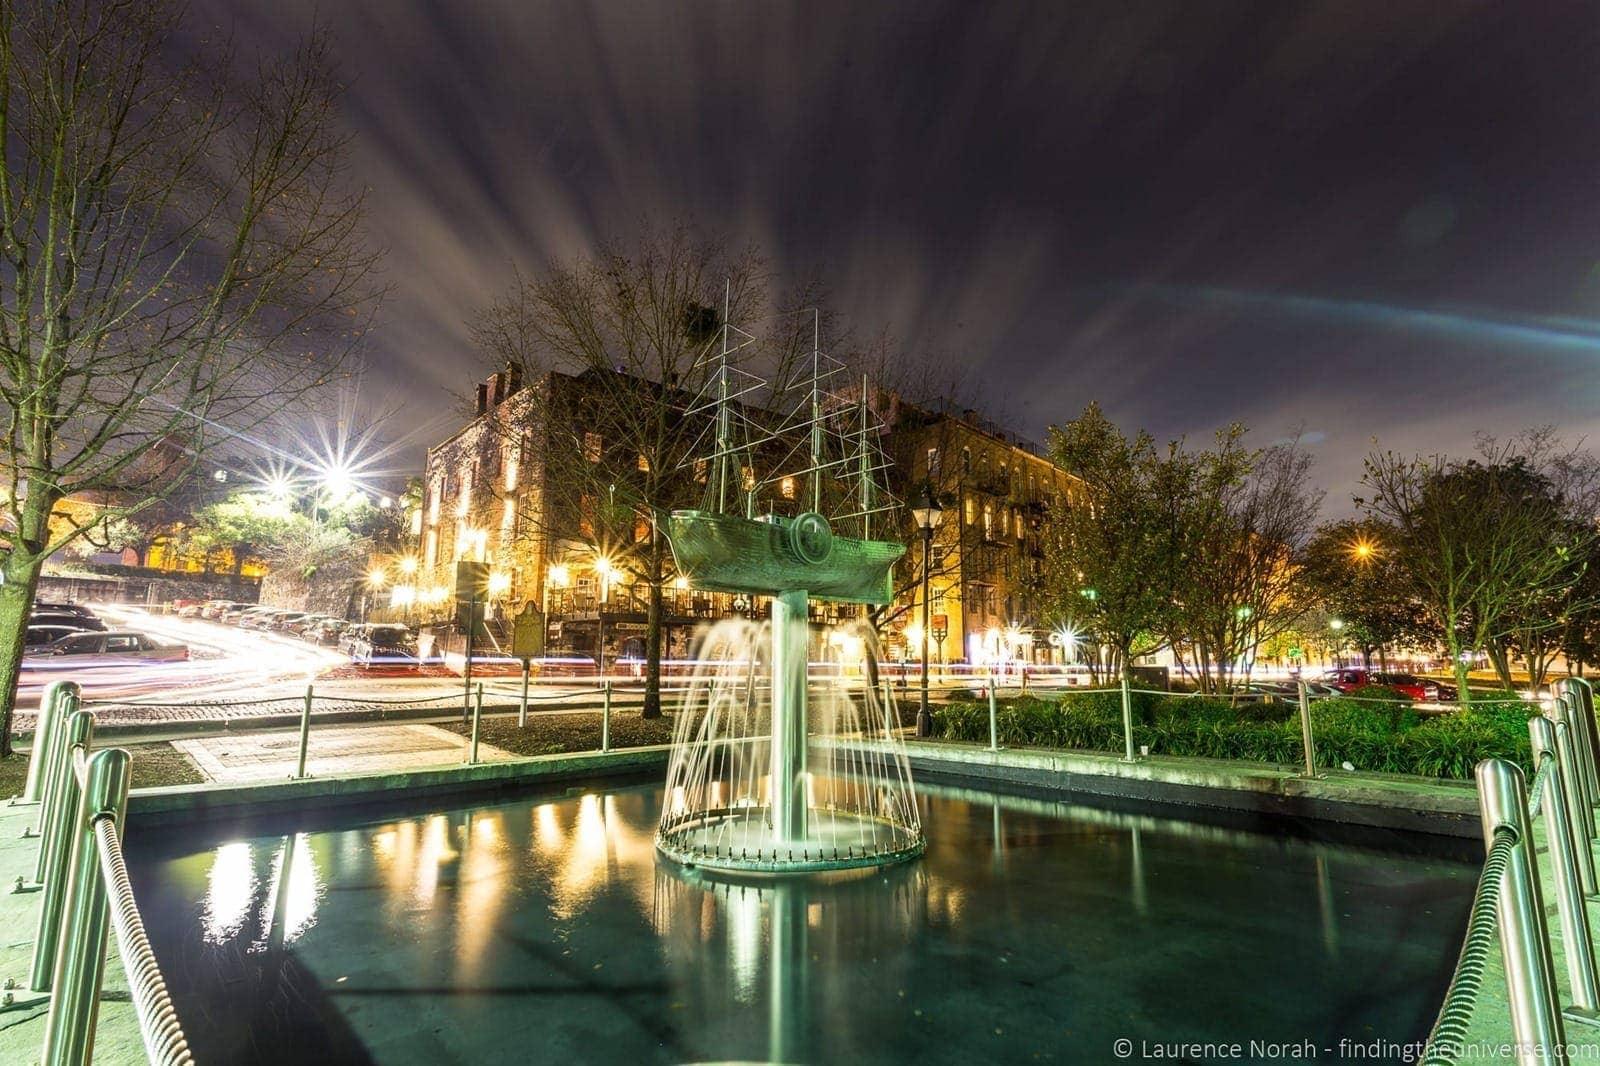 Places to Enjoy the Nightlife in Savannah